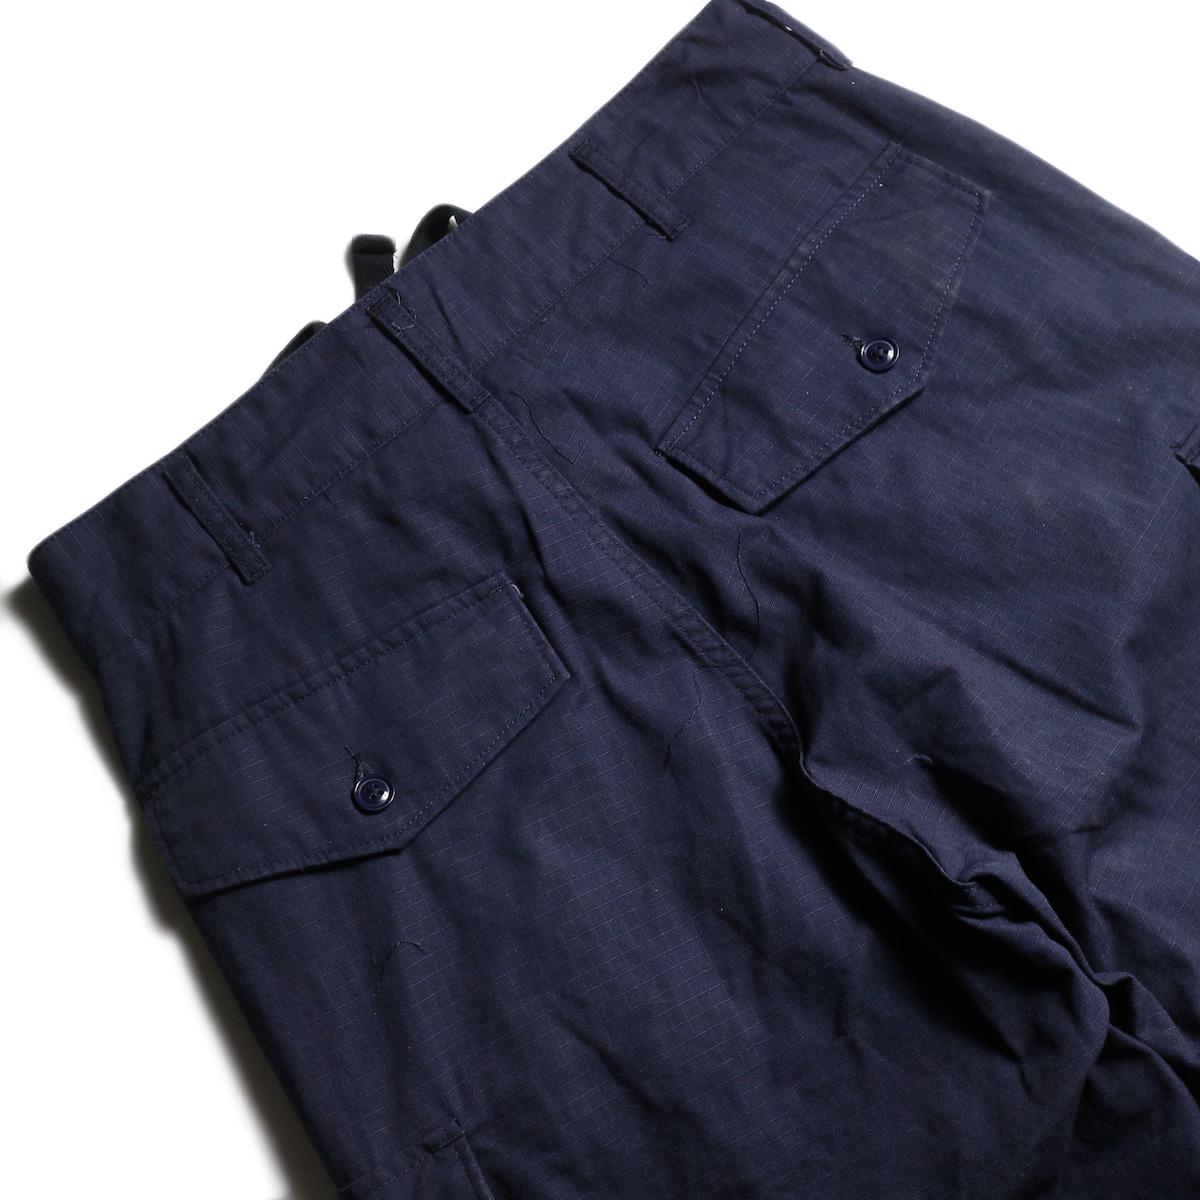 ENGINEERED GARMENTS /  FA Pant -Cotton Ripstop (Navy) ヒップポケット